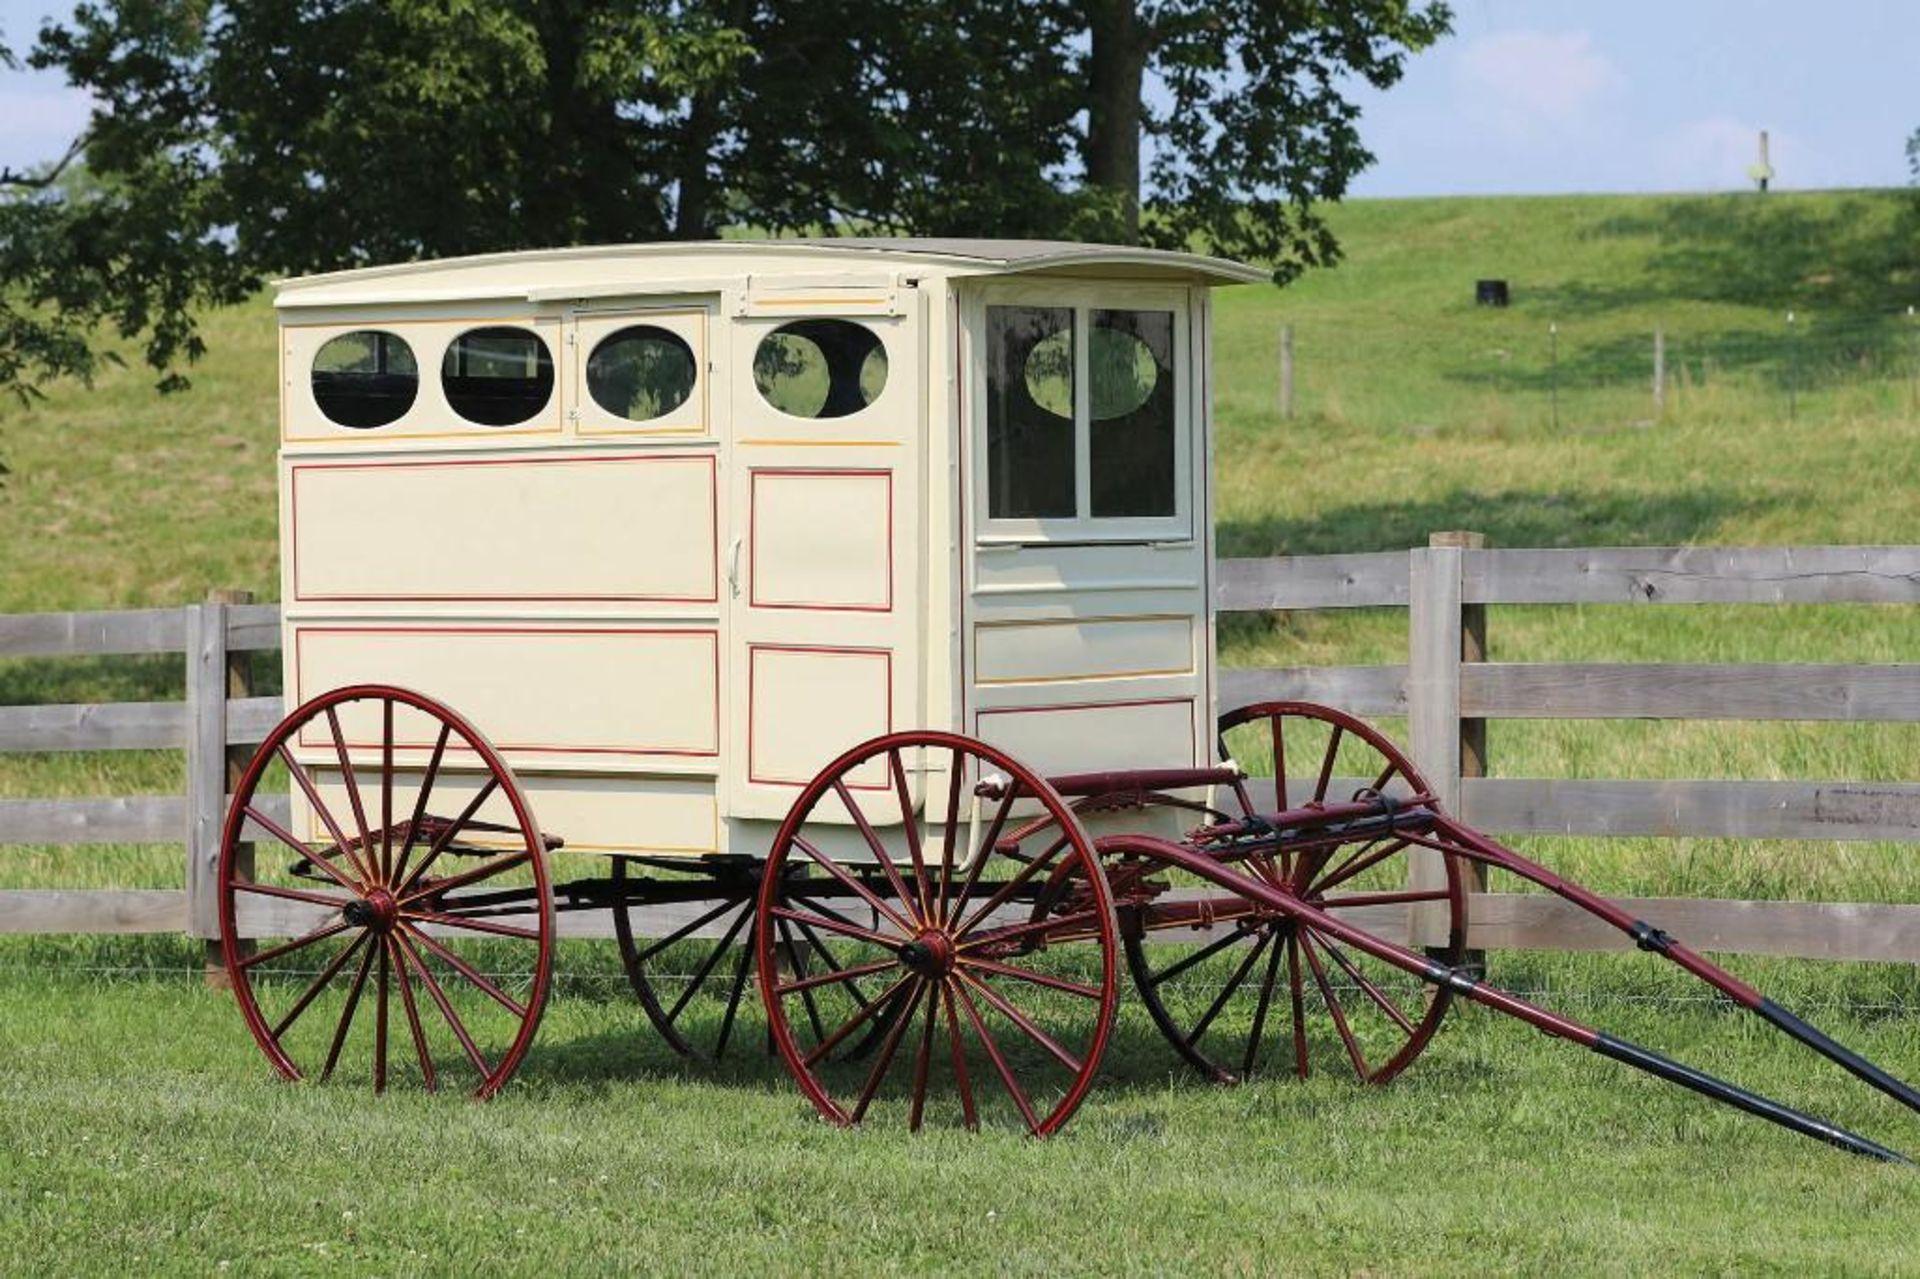 Vintage Restored Bakery Wagon w/Shafts - Image 2 of 2